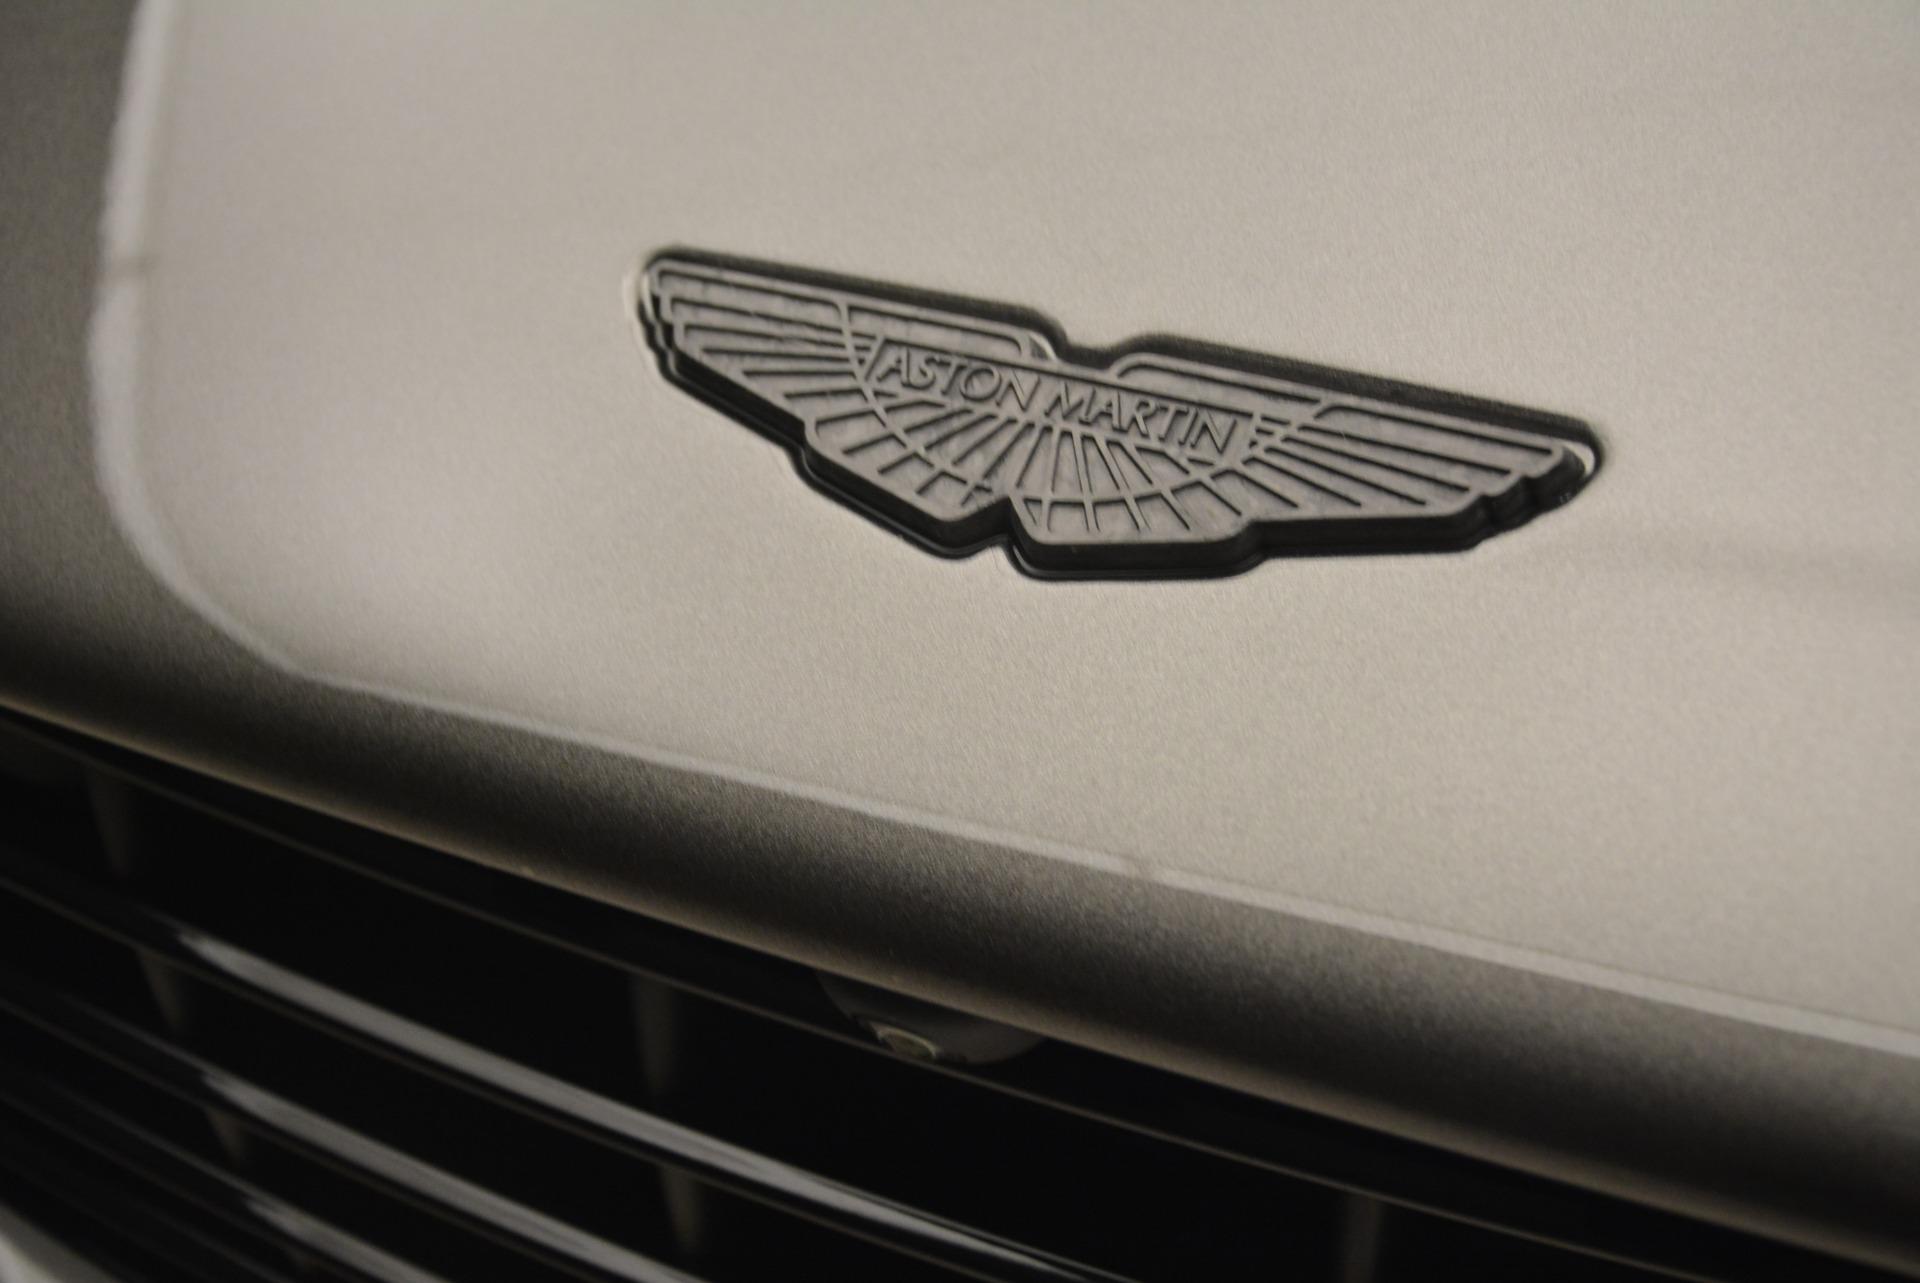 New 2019 Aston Martin DB11 Volante  For Sale In Westport, CT 2209_p33